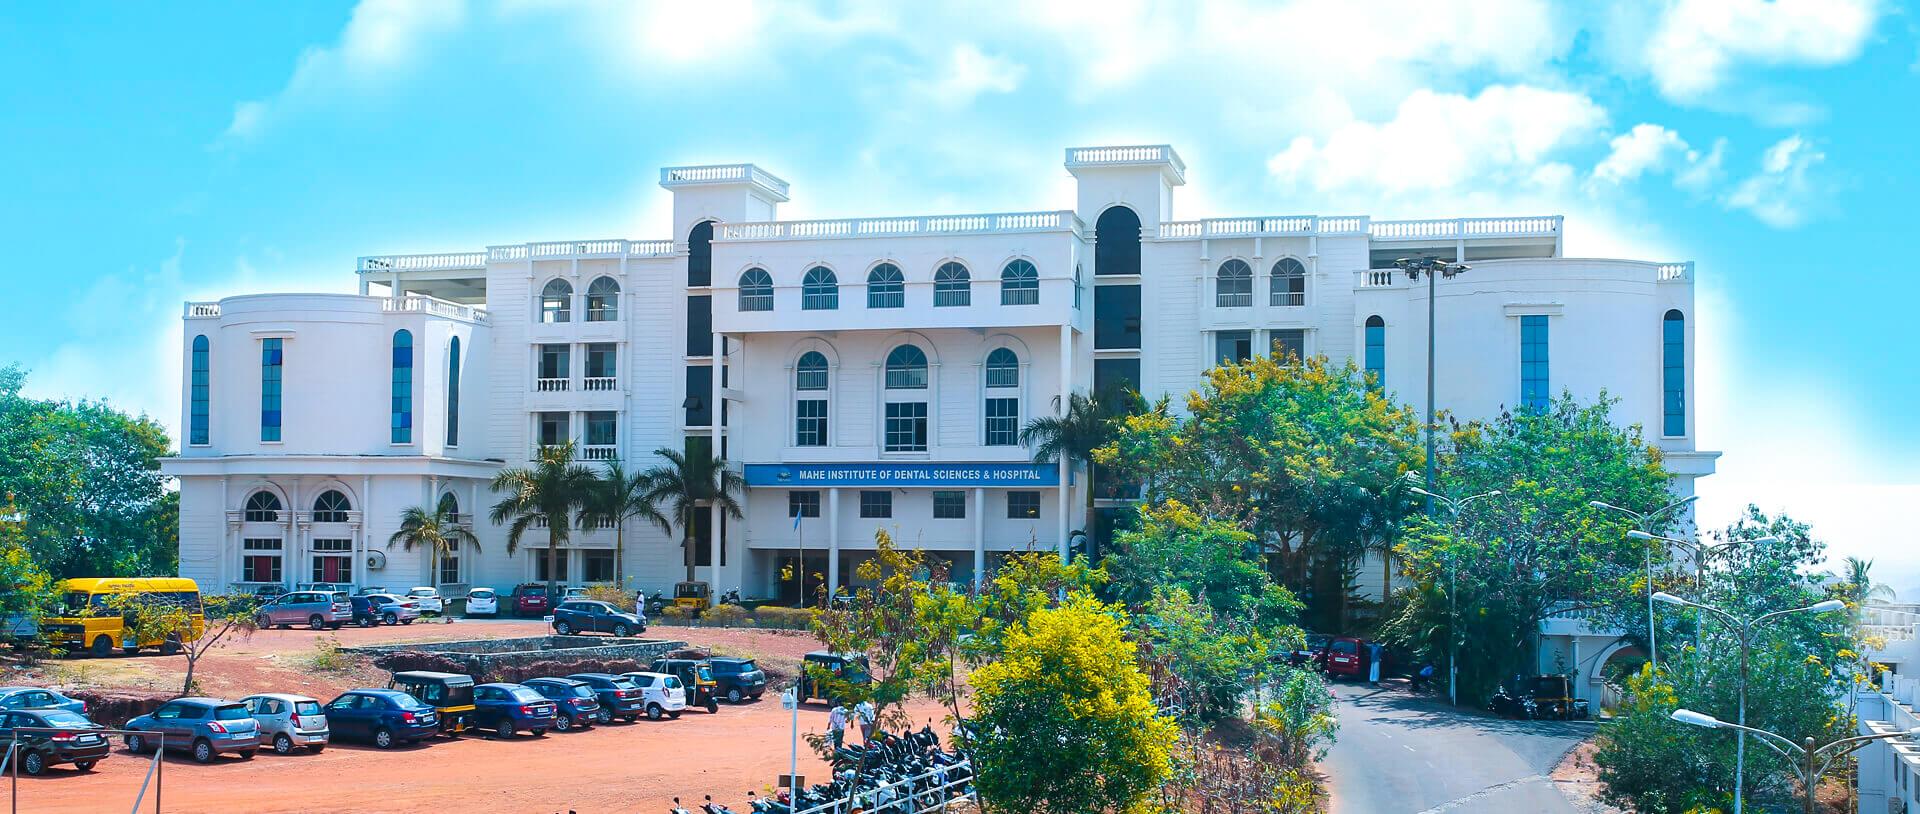 Mahe Institute of Dental Sciences and Hospital, Mahe Image